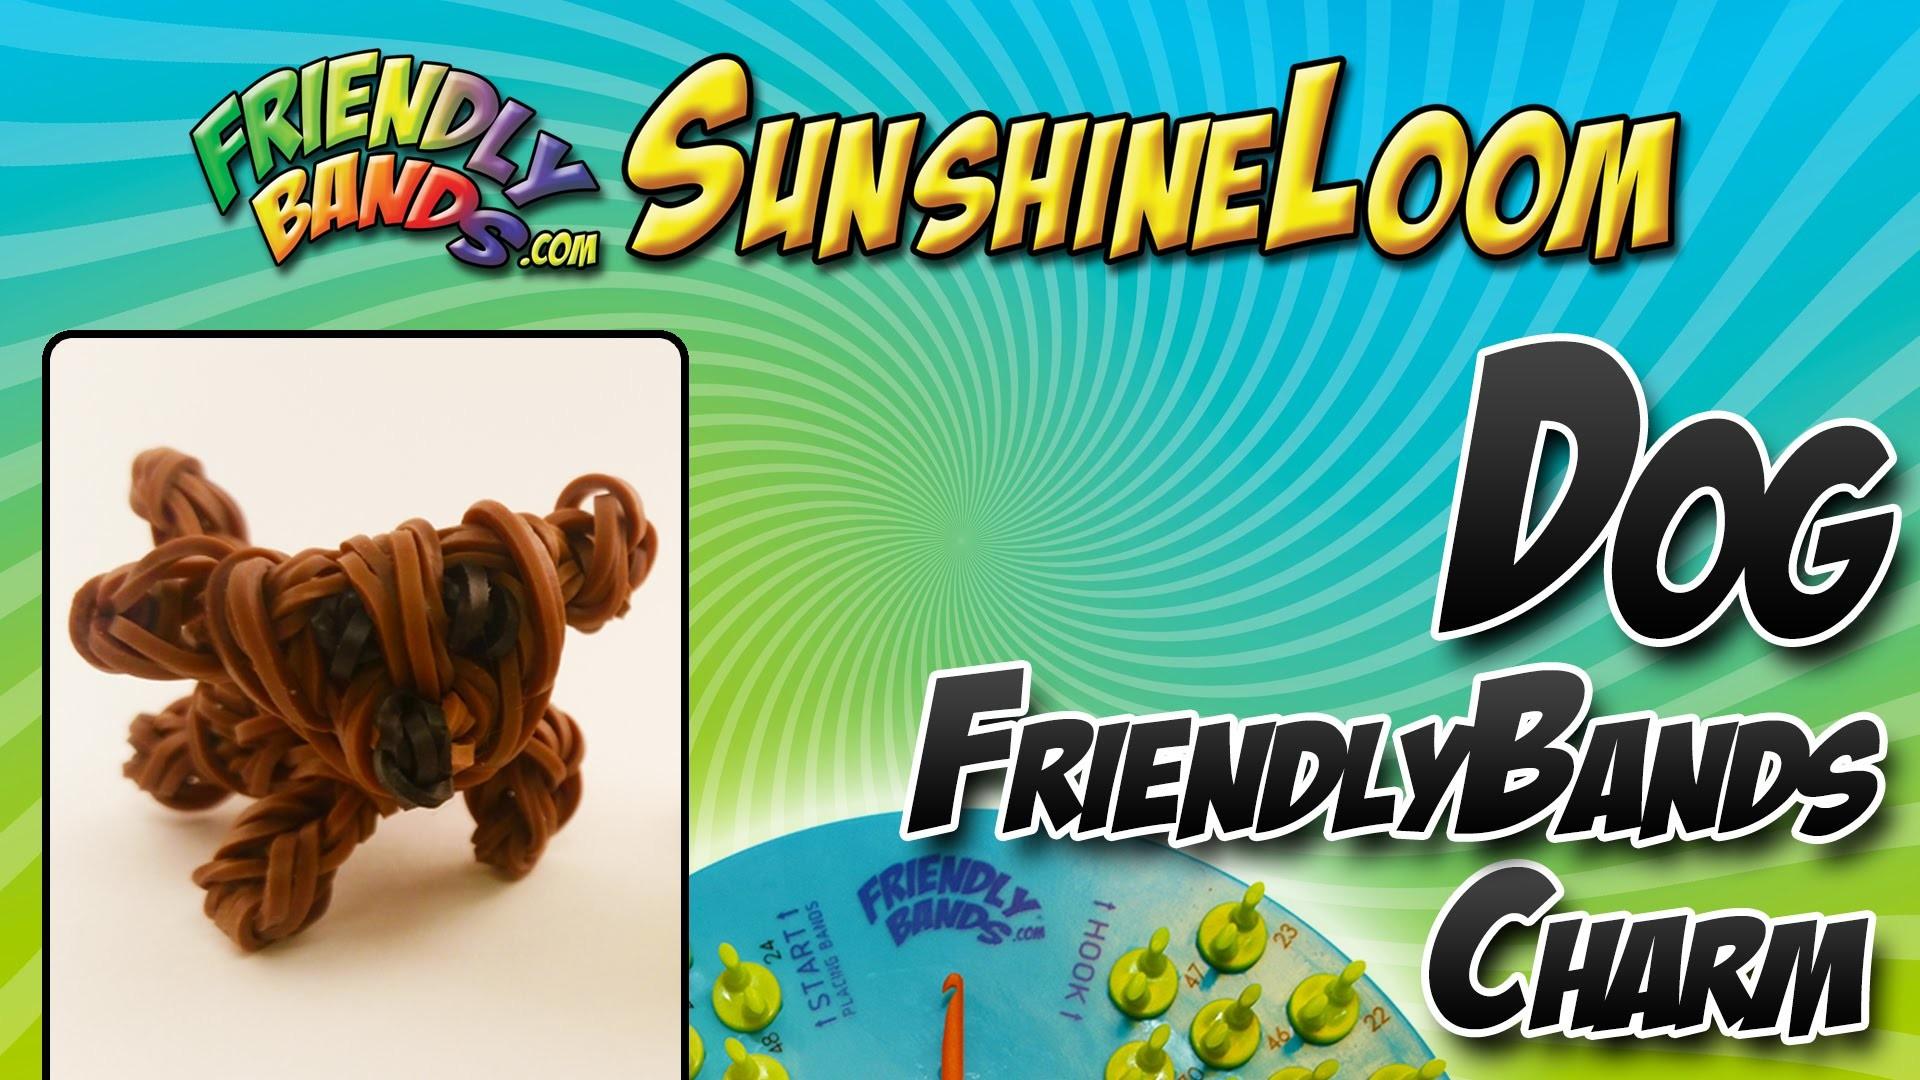 How to Make a FriendlyBand SunshineLoom - Dog Charm Video Tutorial